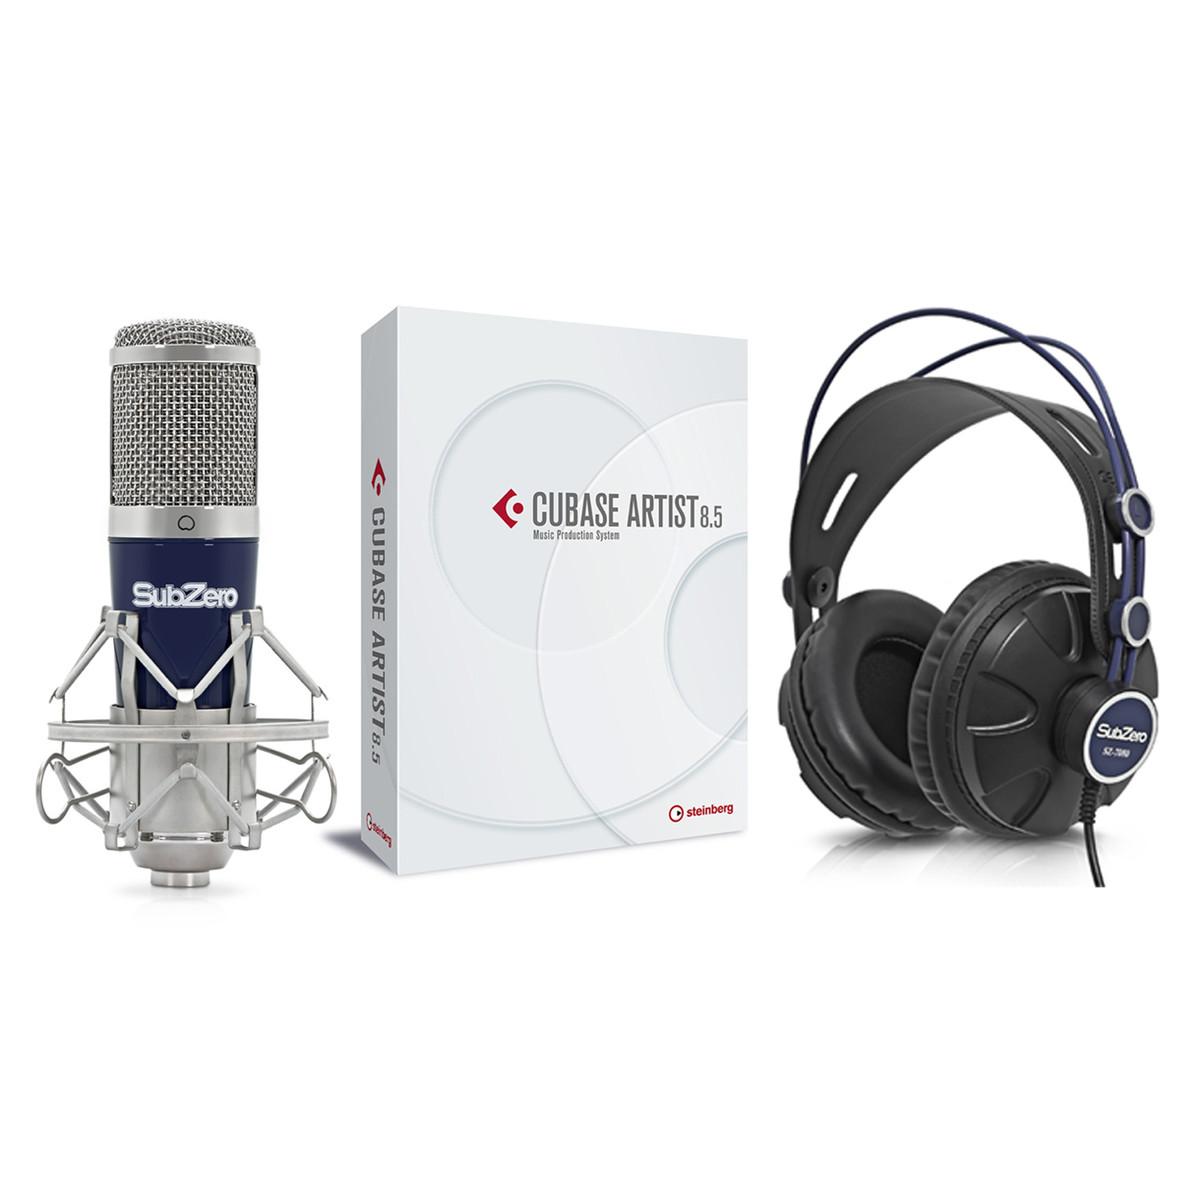 Image of Steinberg Cubase Artist 8.5 Vocal Recording Bundle